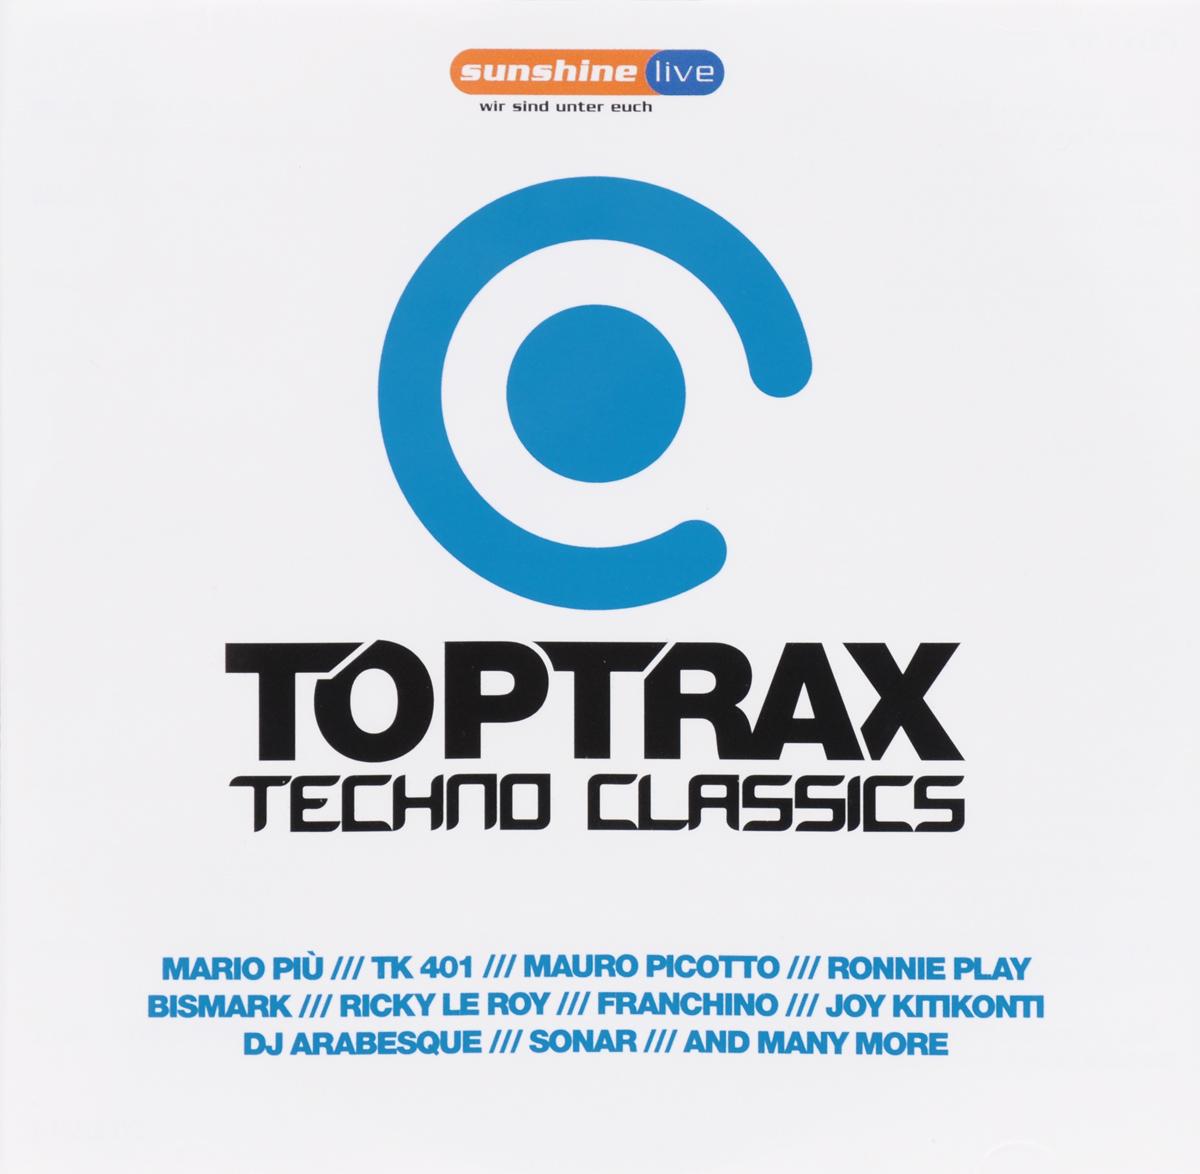 Toptrax Techno Classics (2 CD) 2011 2 Audio CD